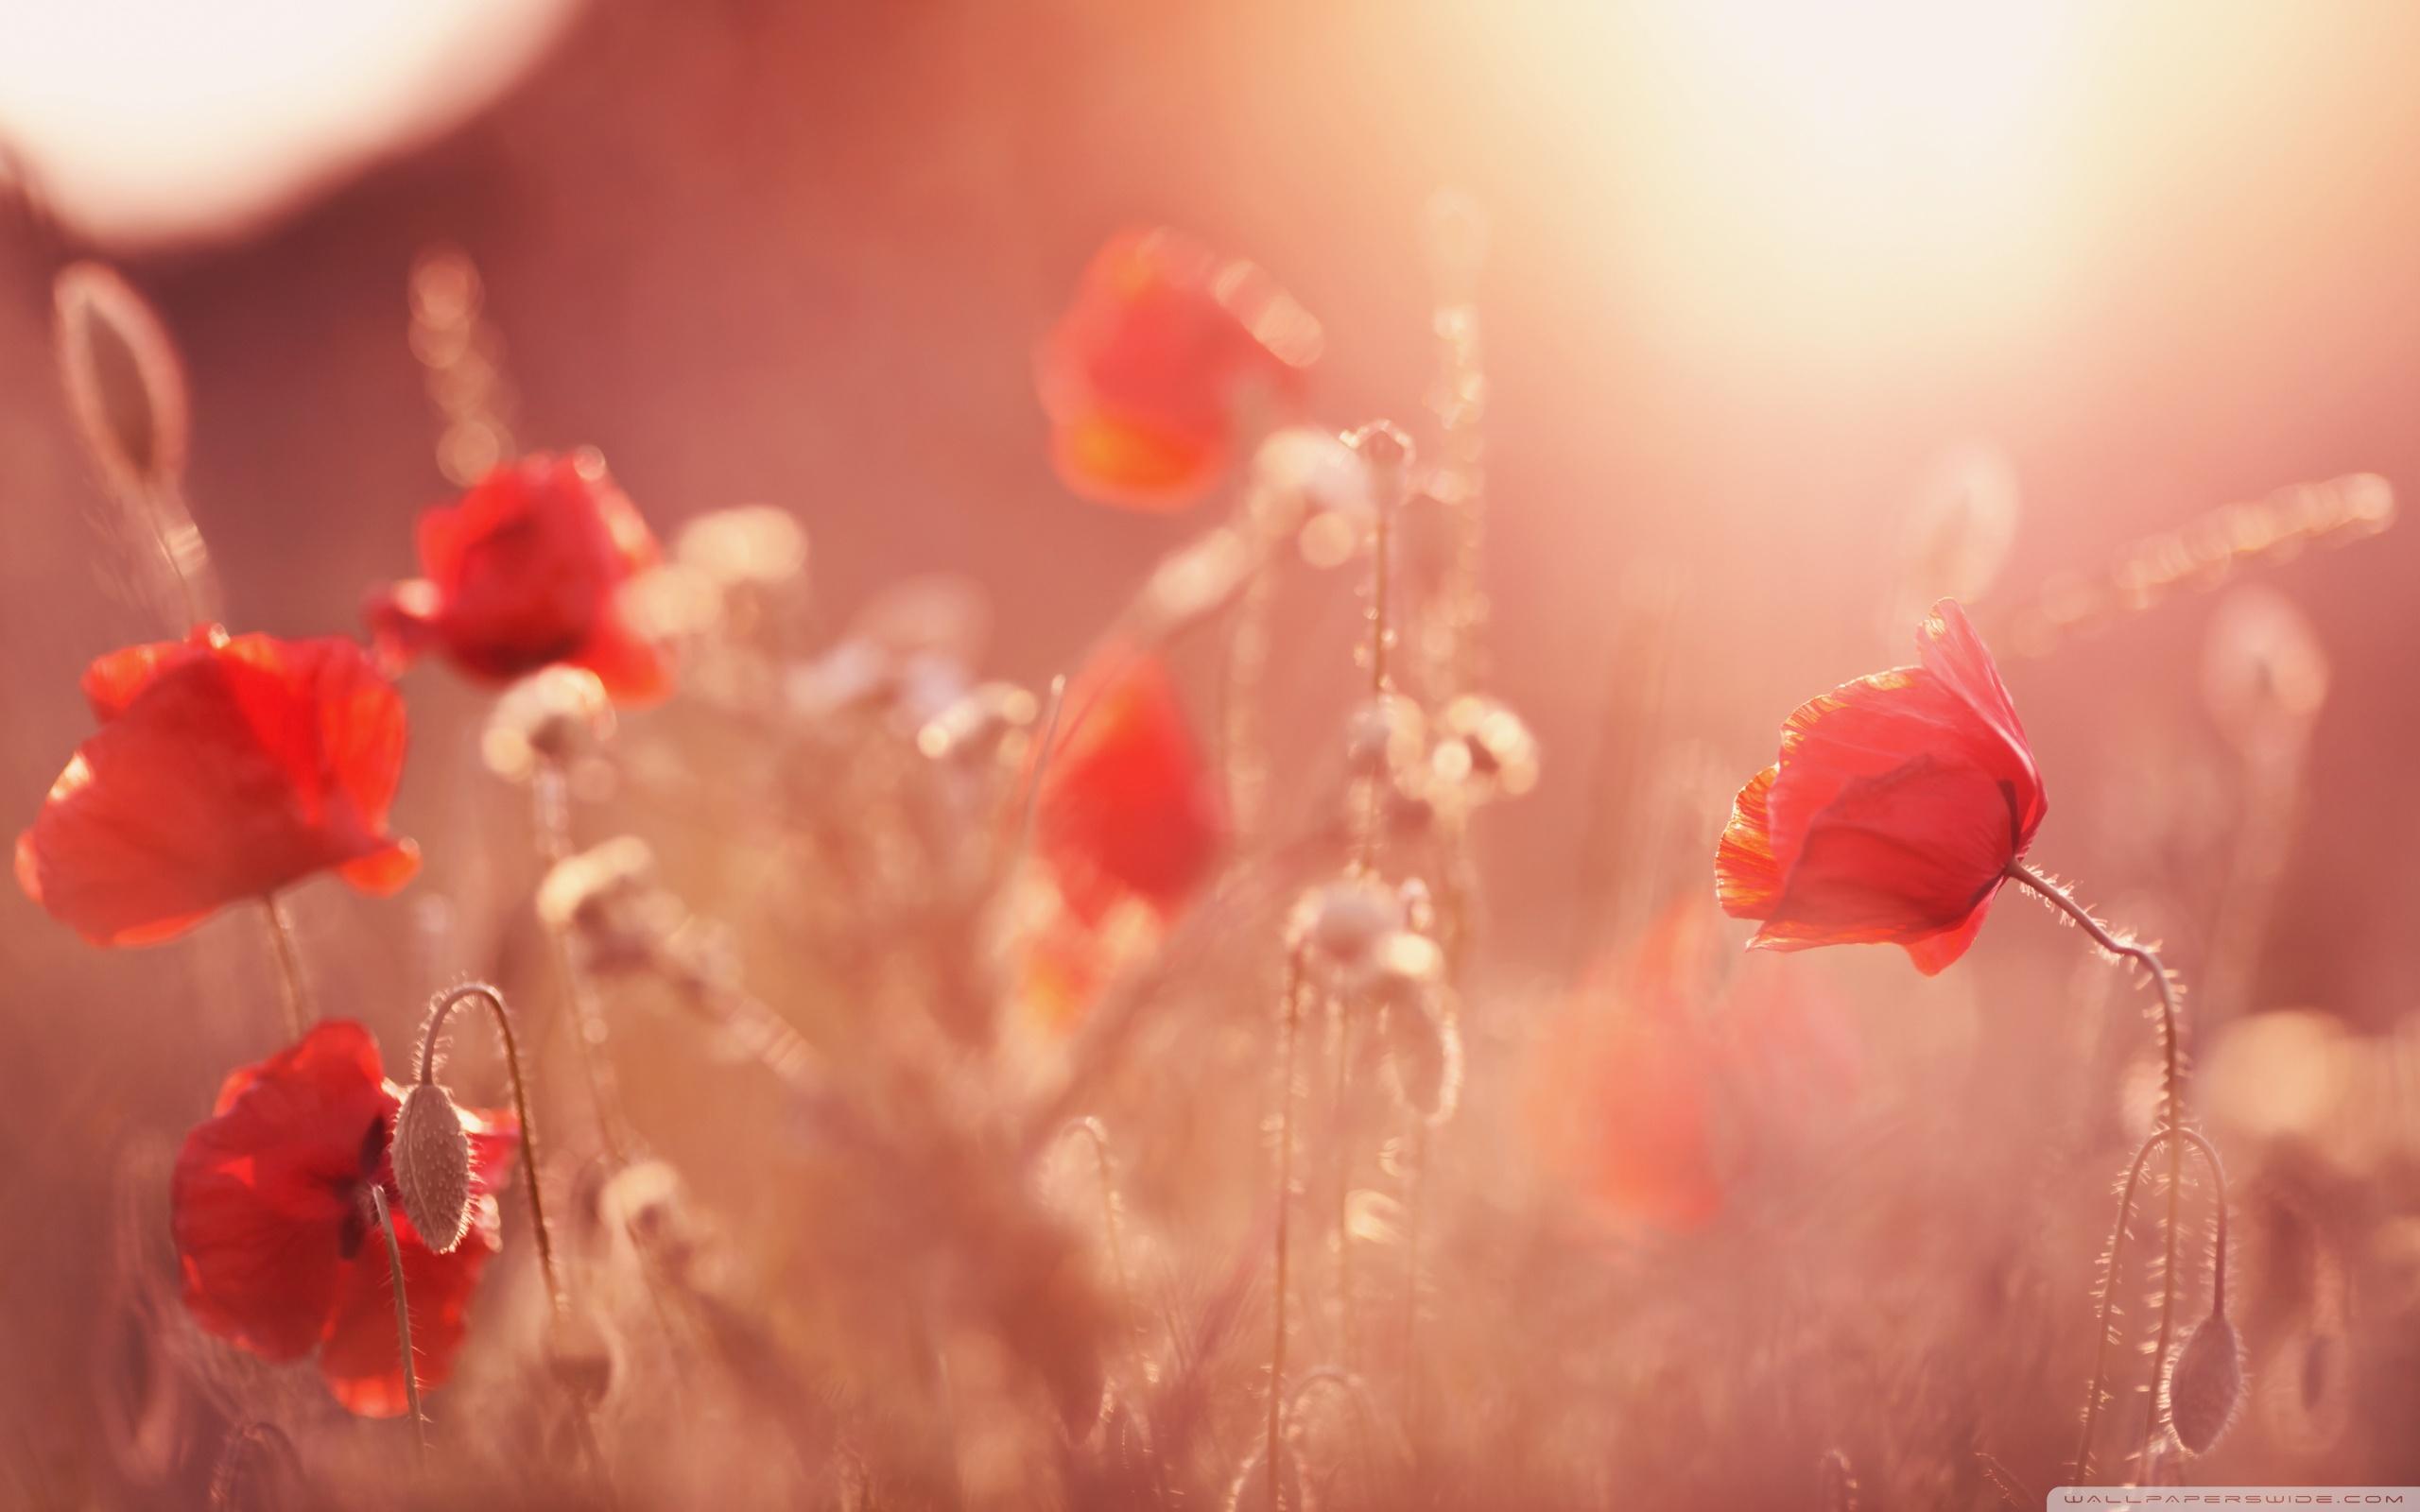 Summer poppies hd